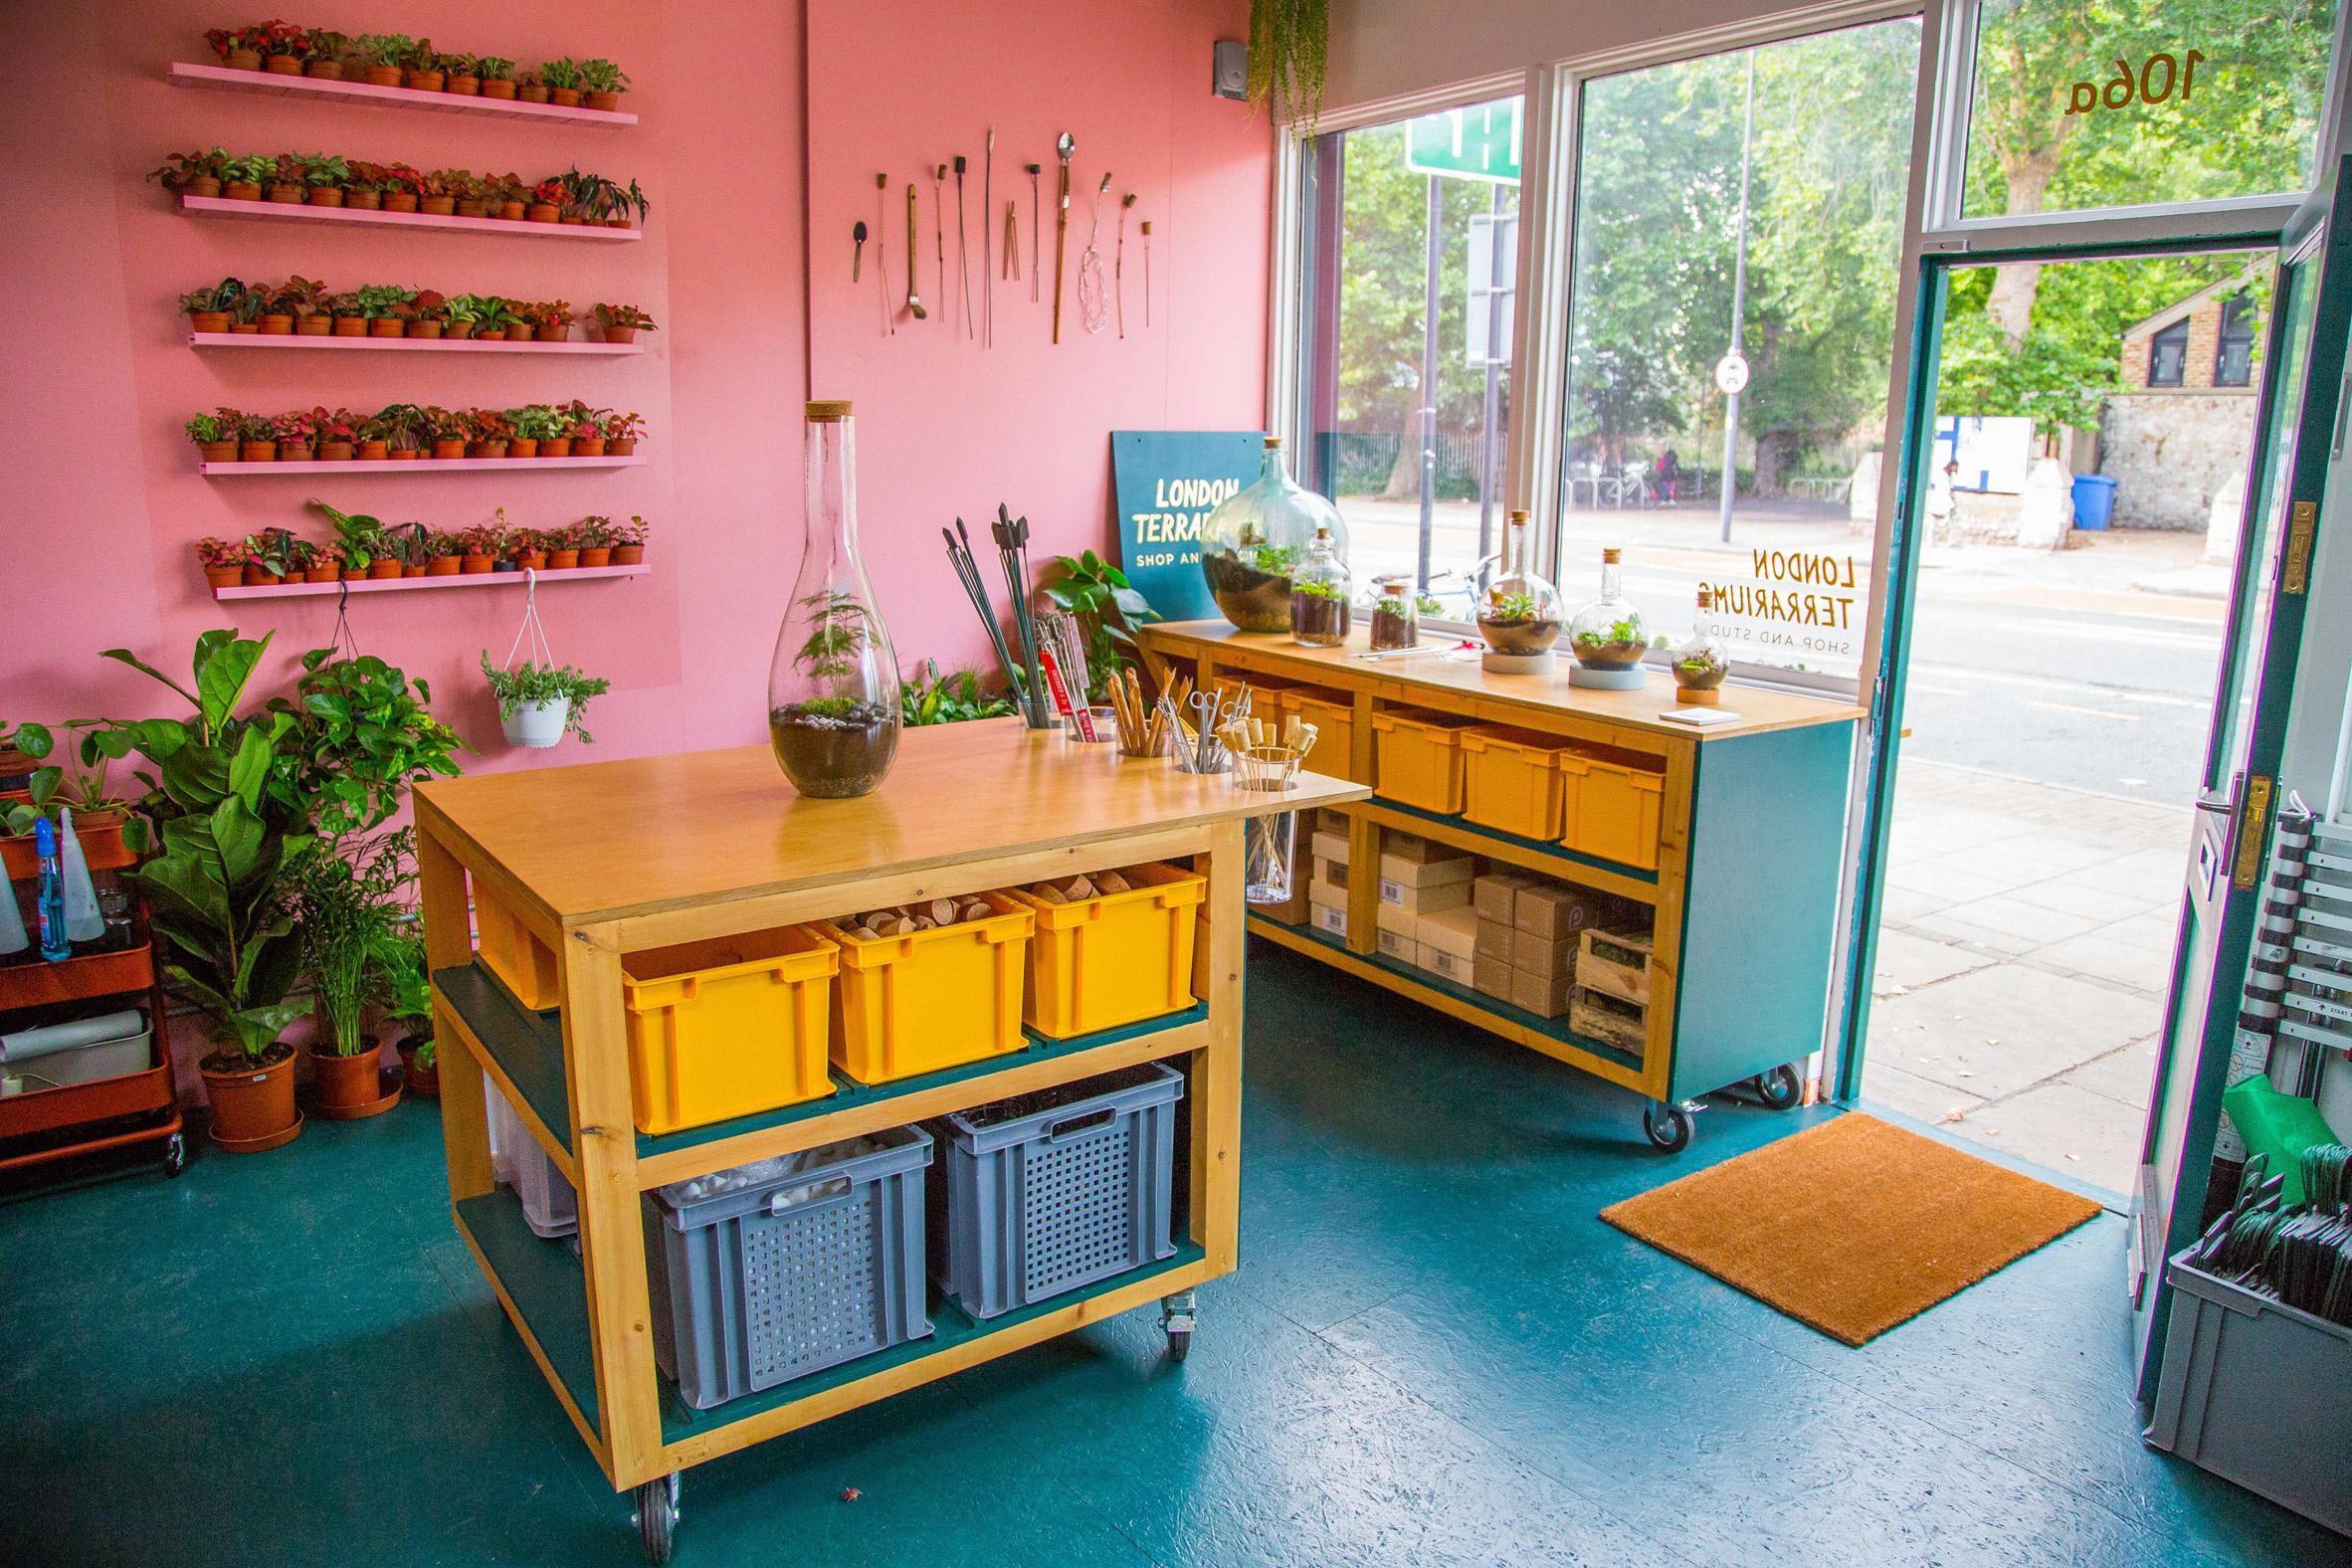 Instagram photo inspires brightly hued terrarium shop in London